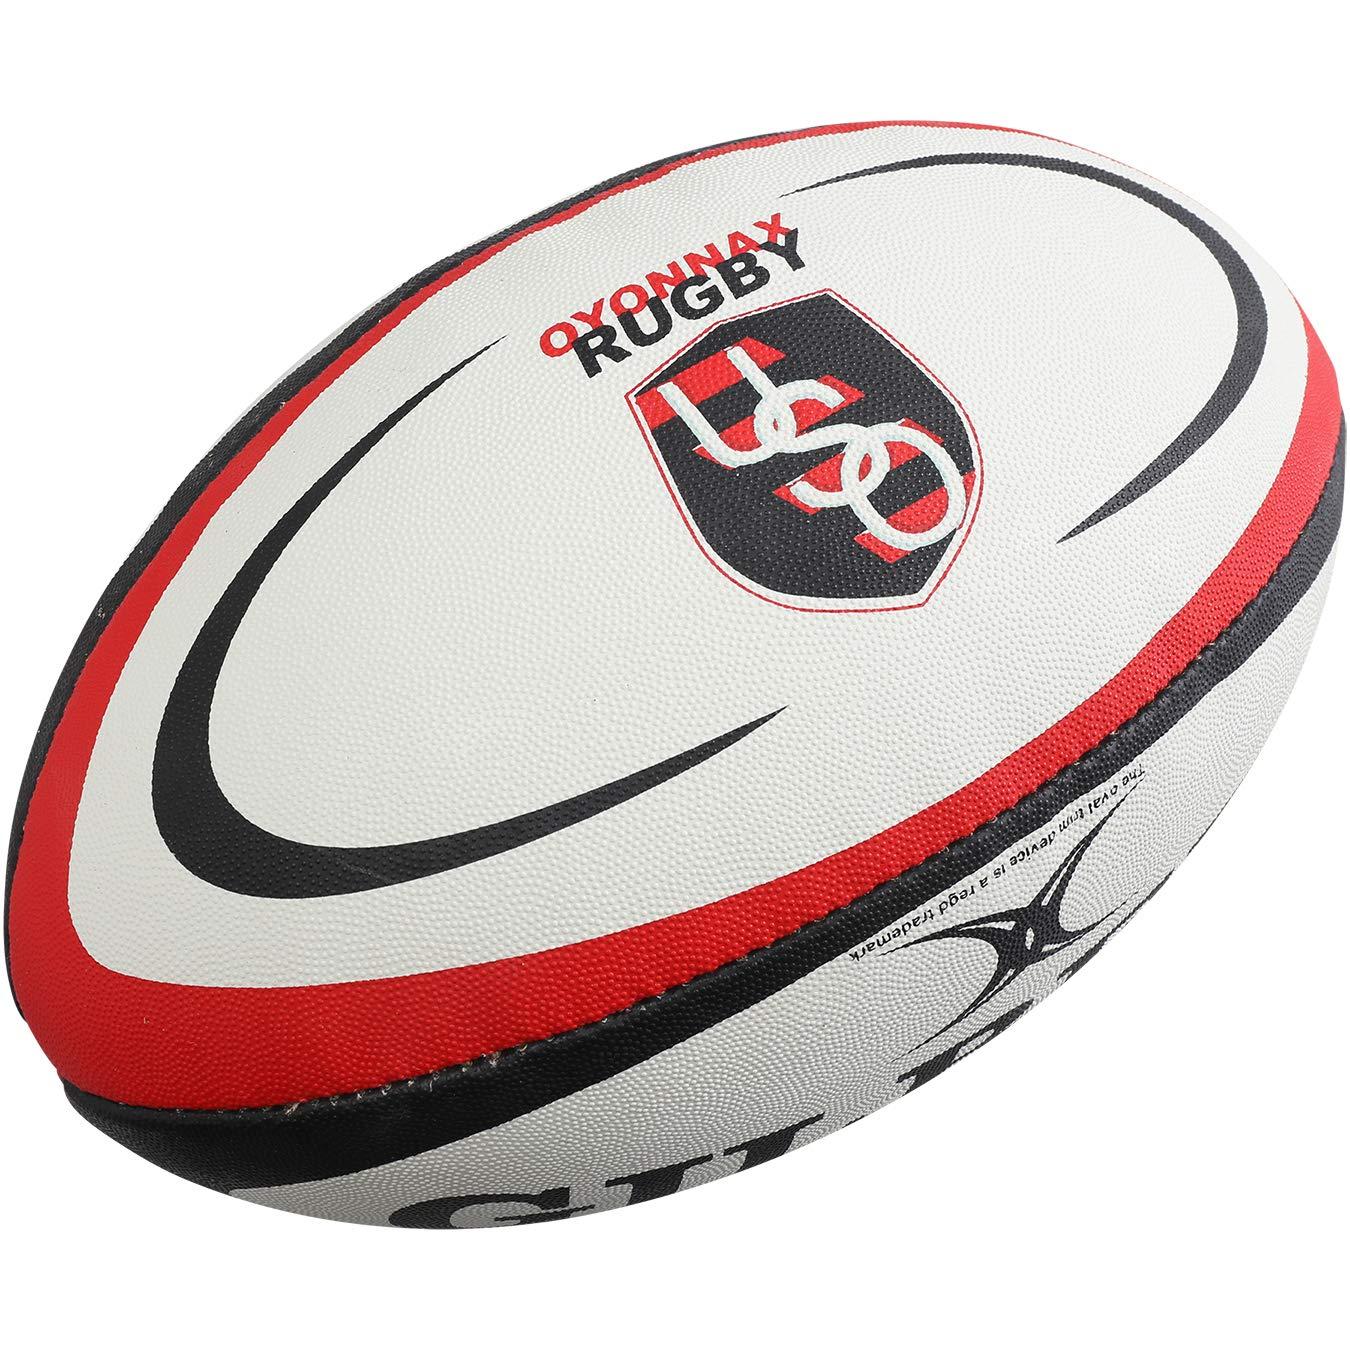 Gilbert Ballon Rugby - Oyonnax Mini 5024686276219